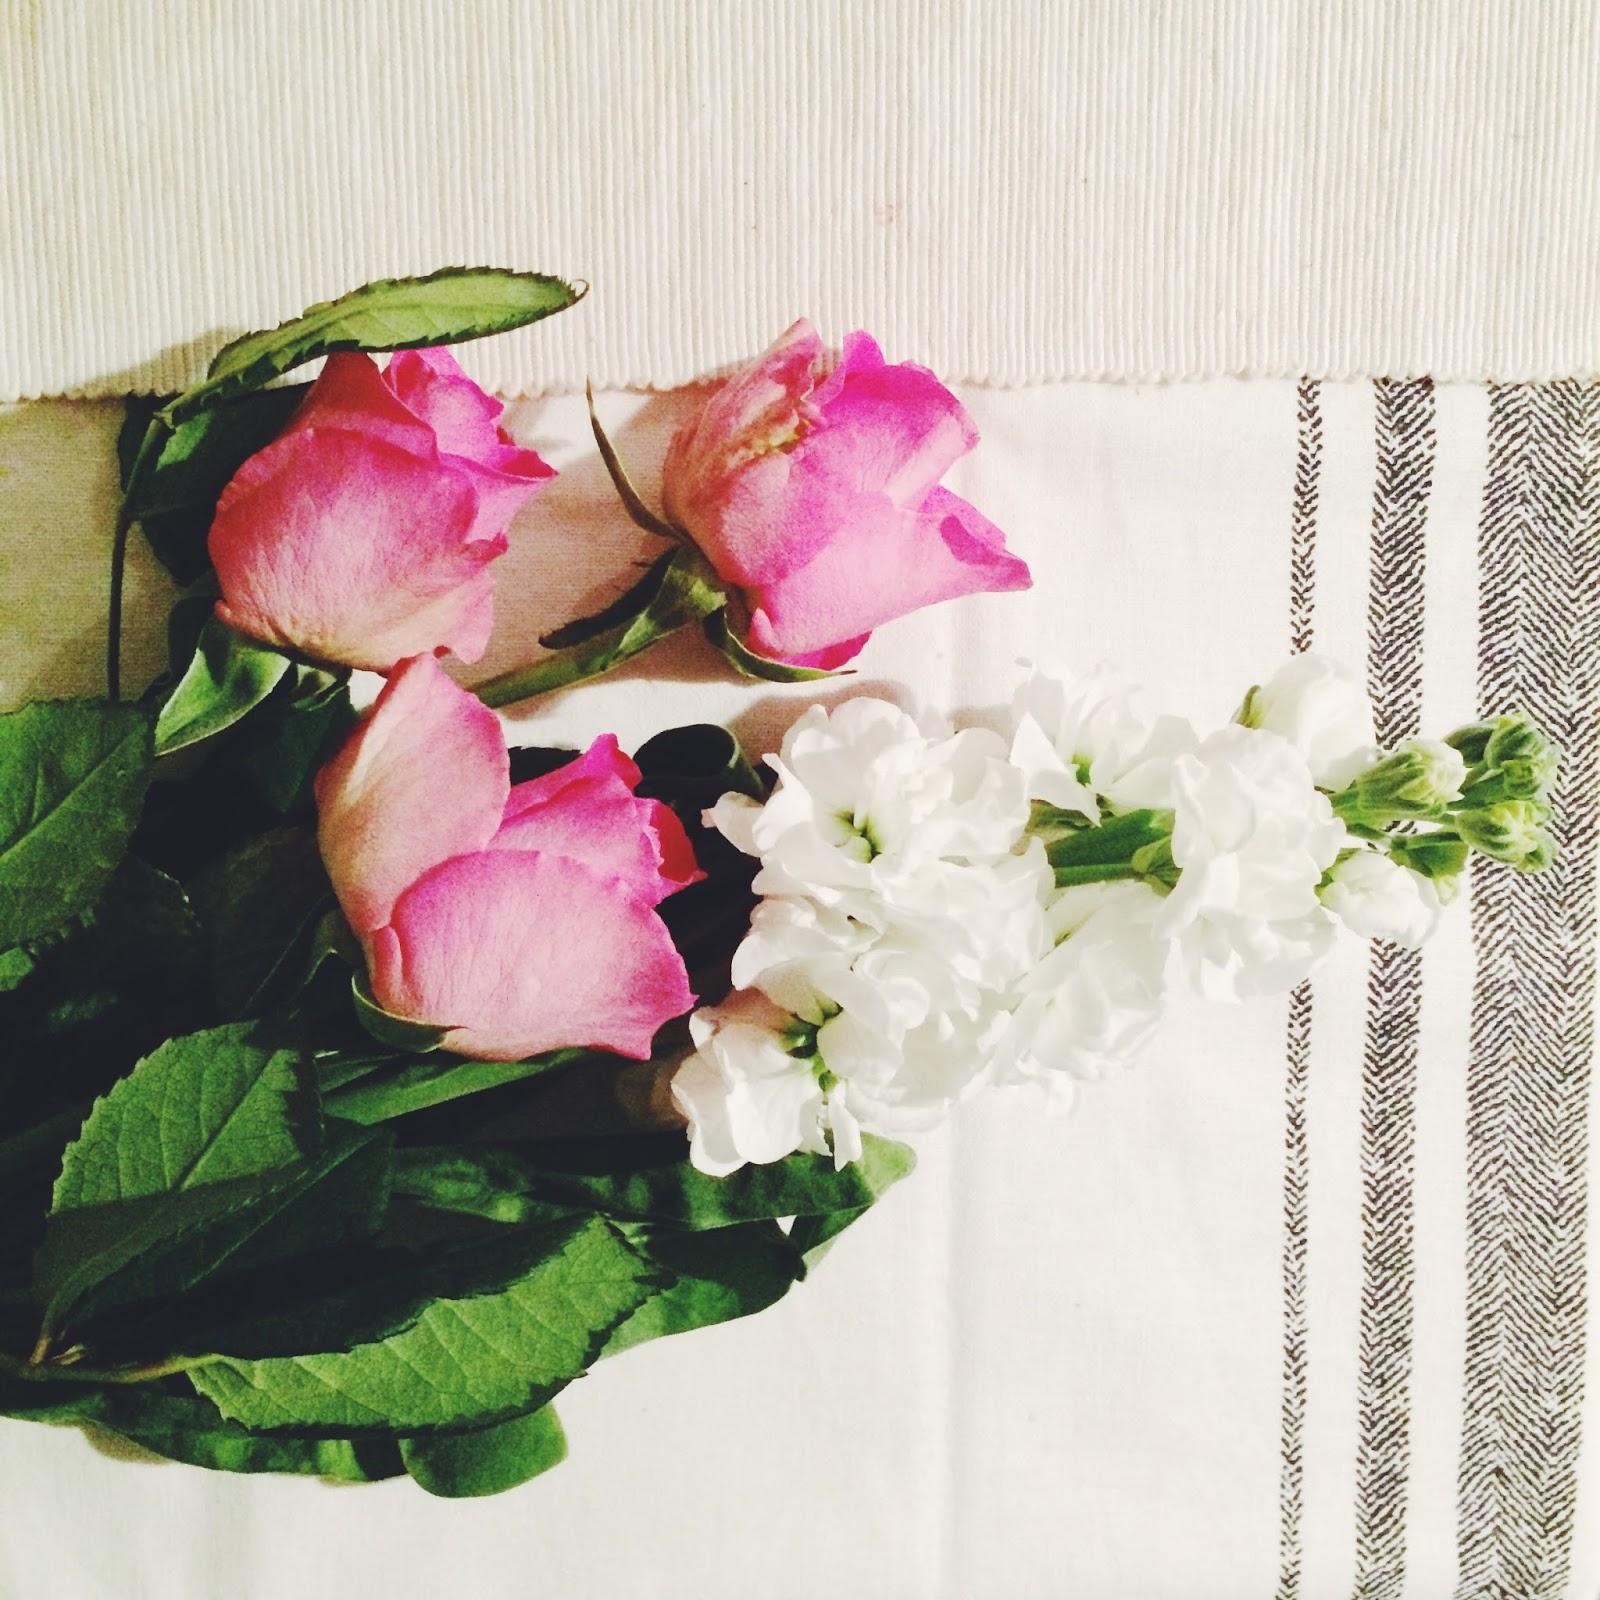 Dalry Rose blog, home decor, what makes a house a home